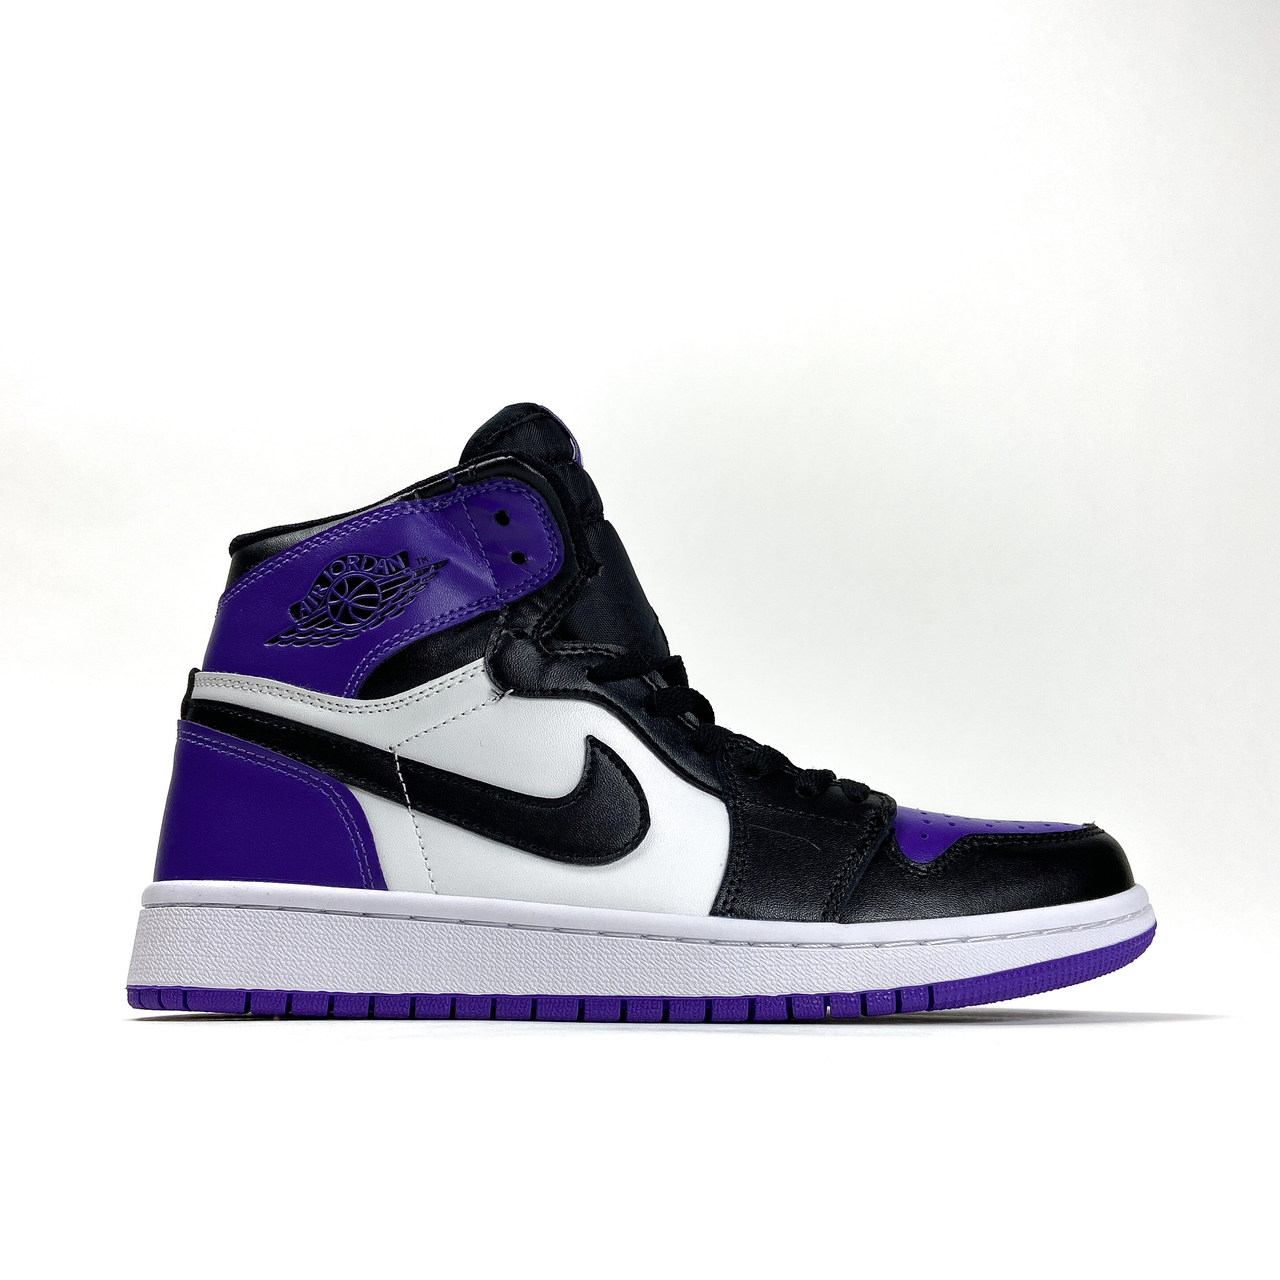 Nike Air Jordan 1 White Violet (Фиолетовый)